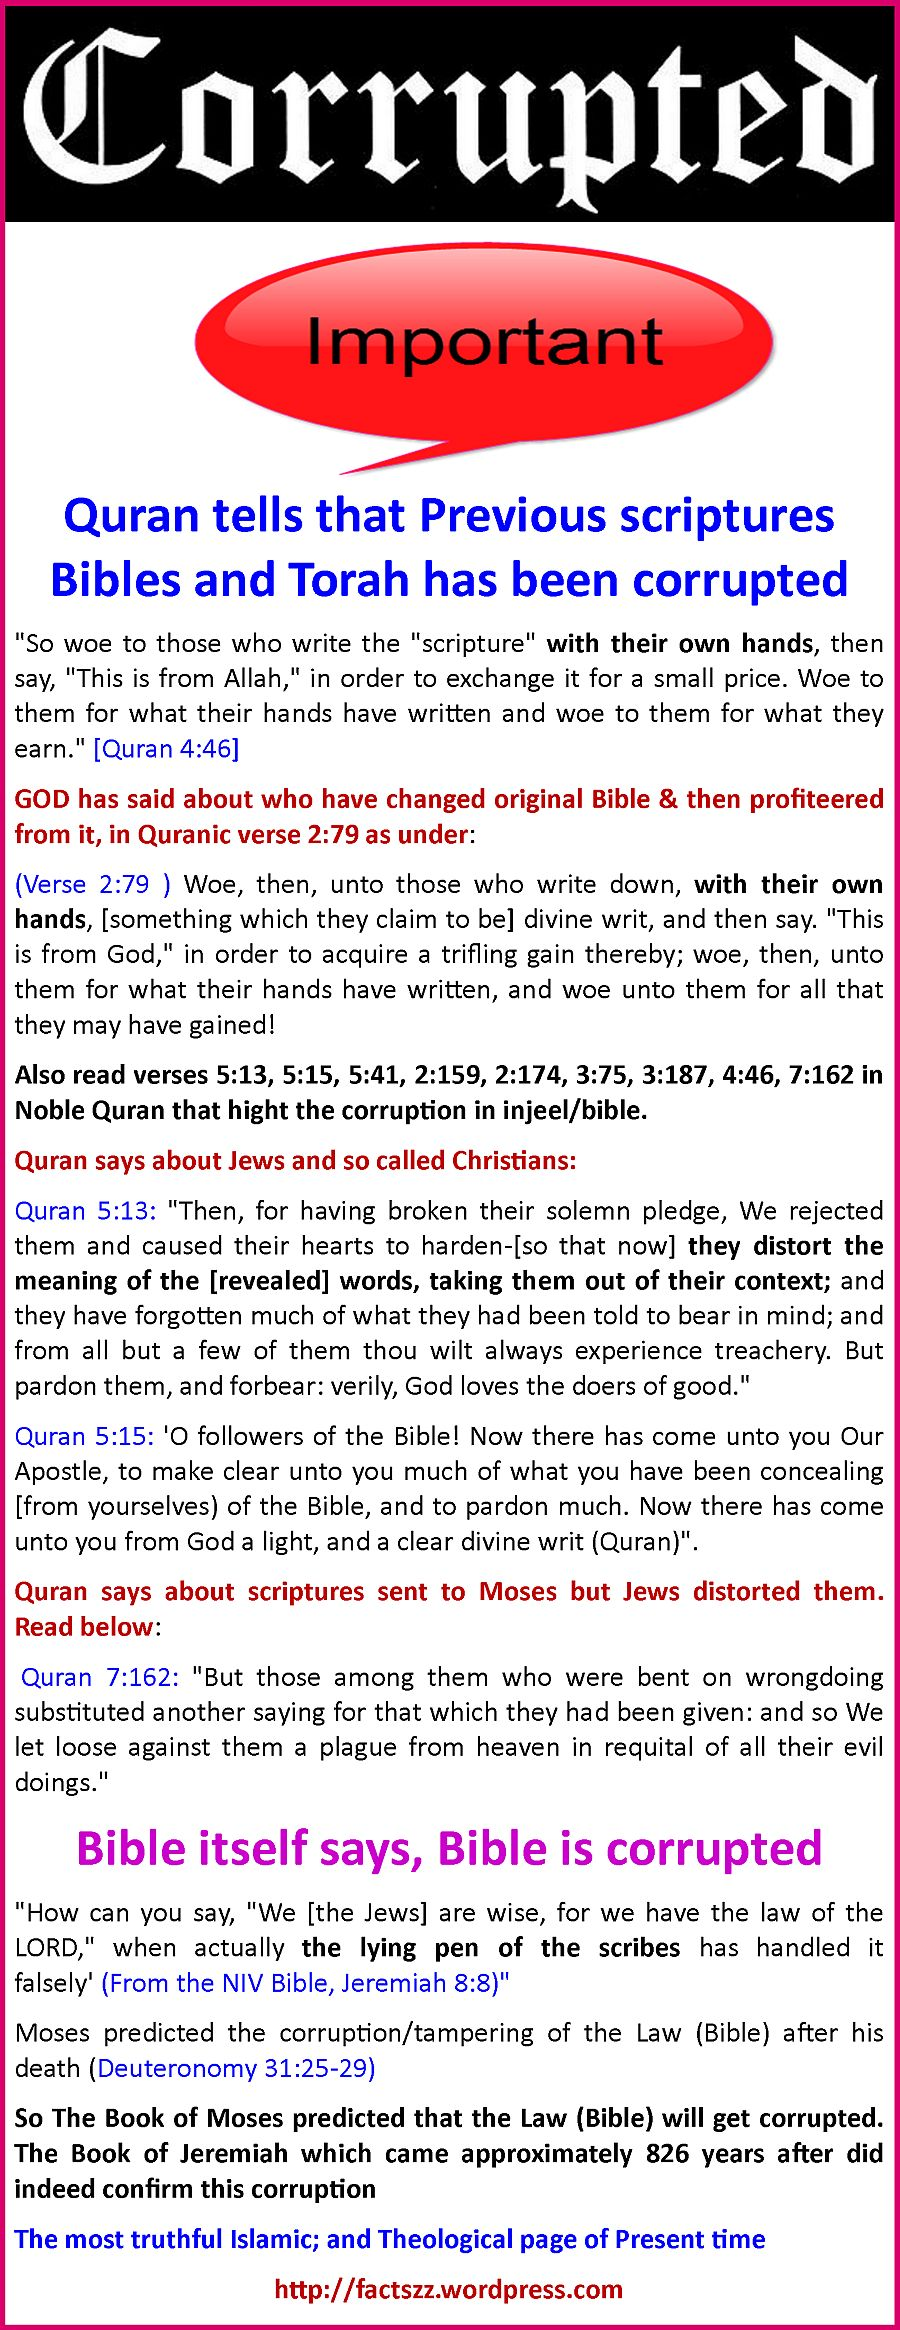 BibleCorruptionAnd QuranF